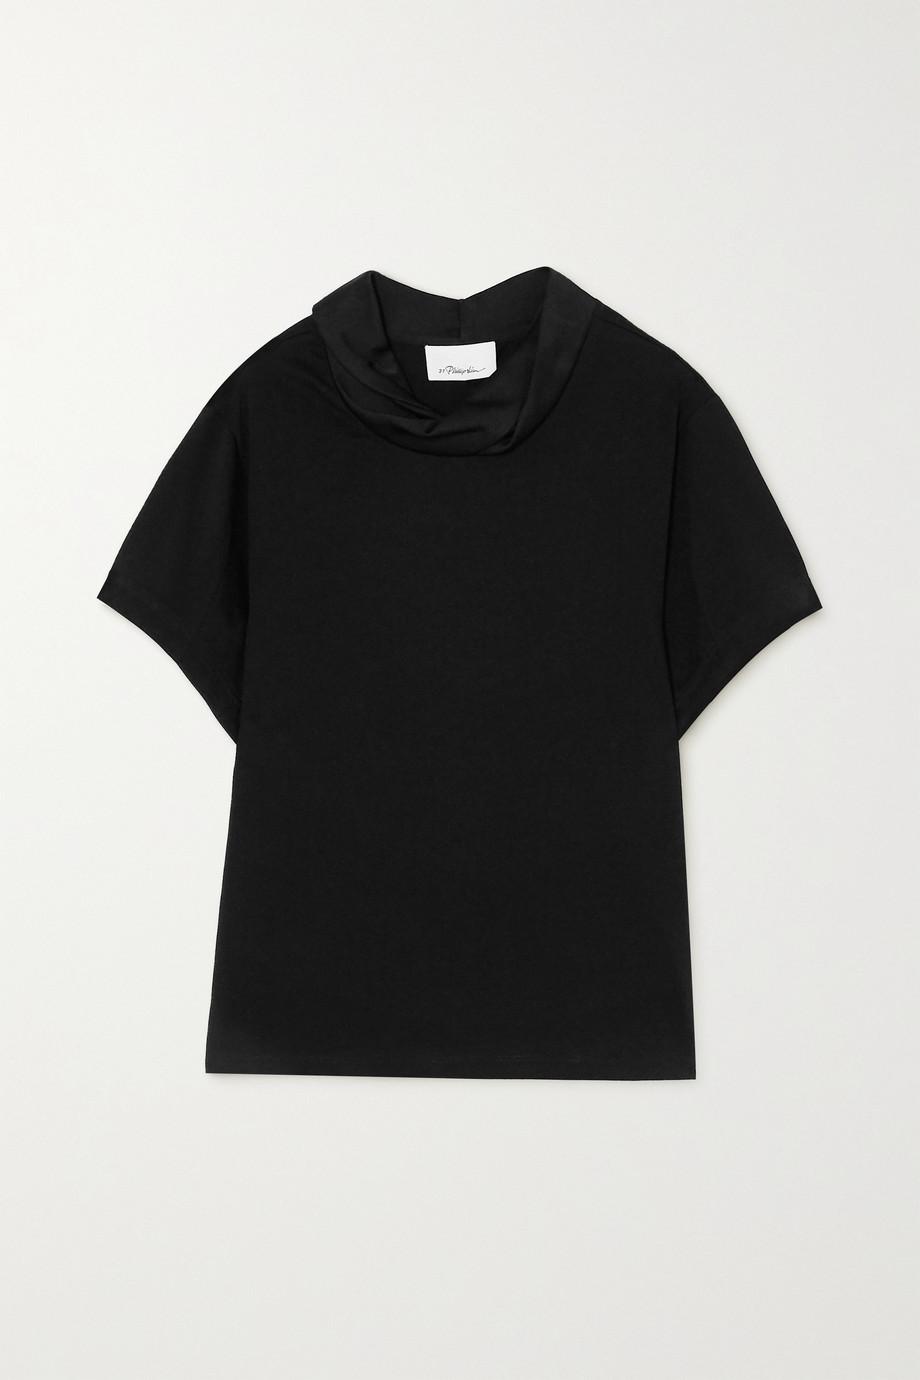 3.1 Phillip Lim 垂褶锤花缎边饰纯棉平纹布 T 恤